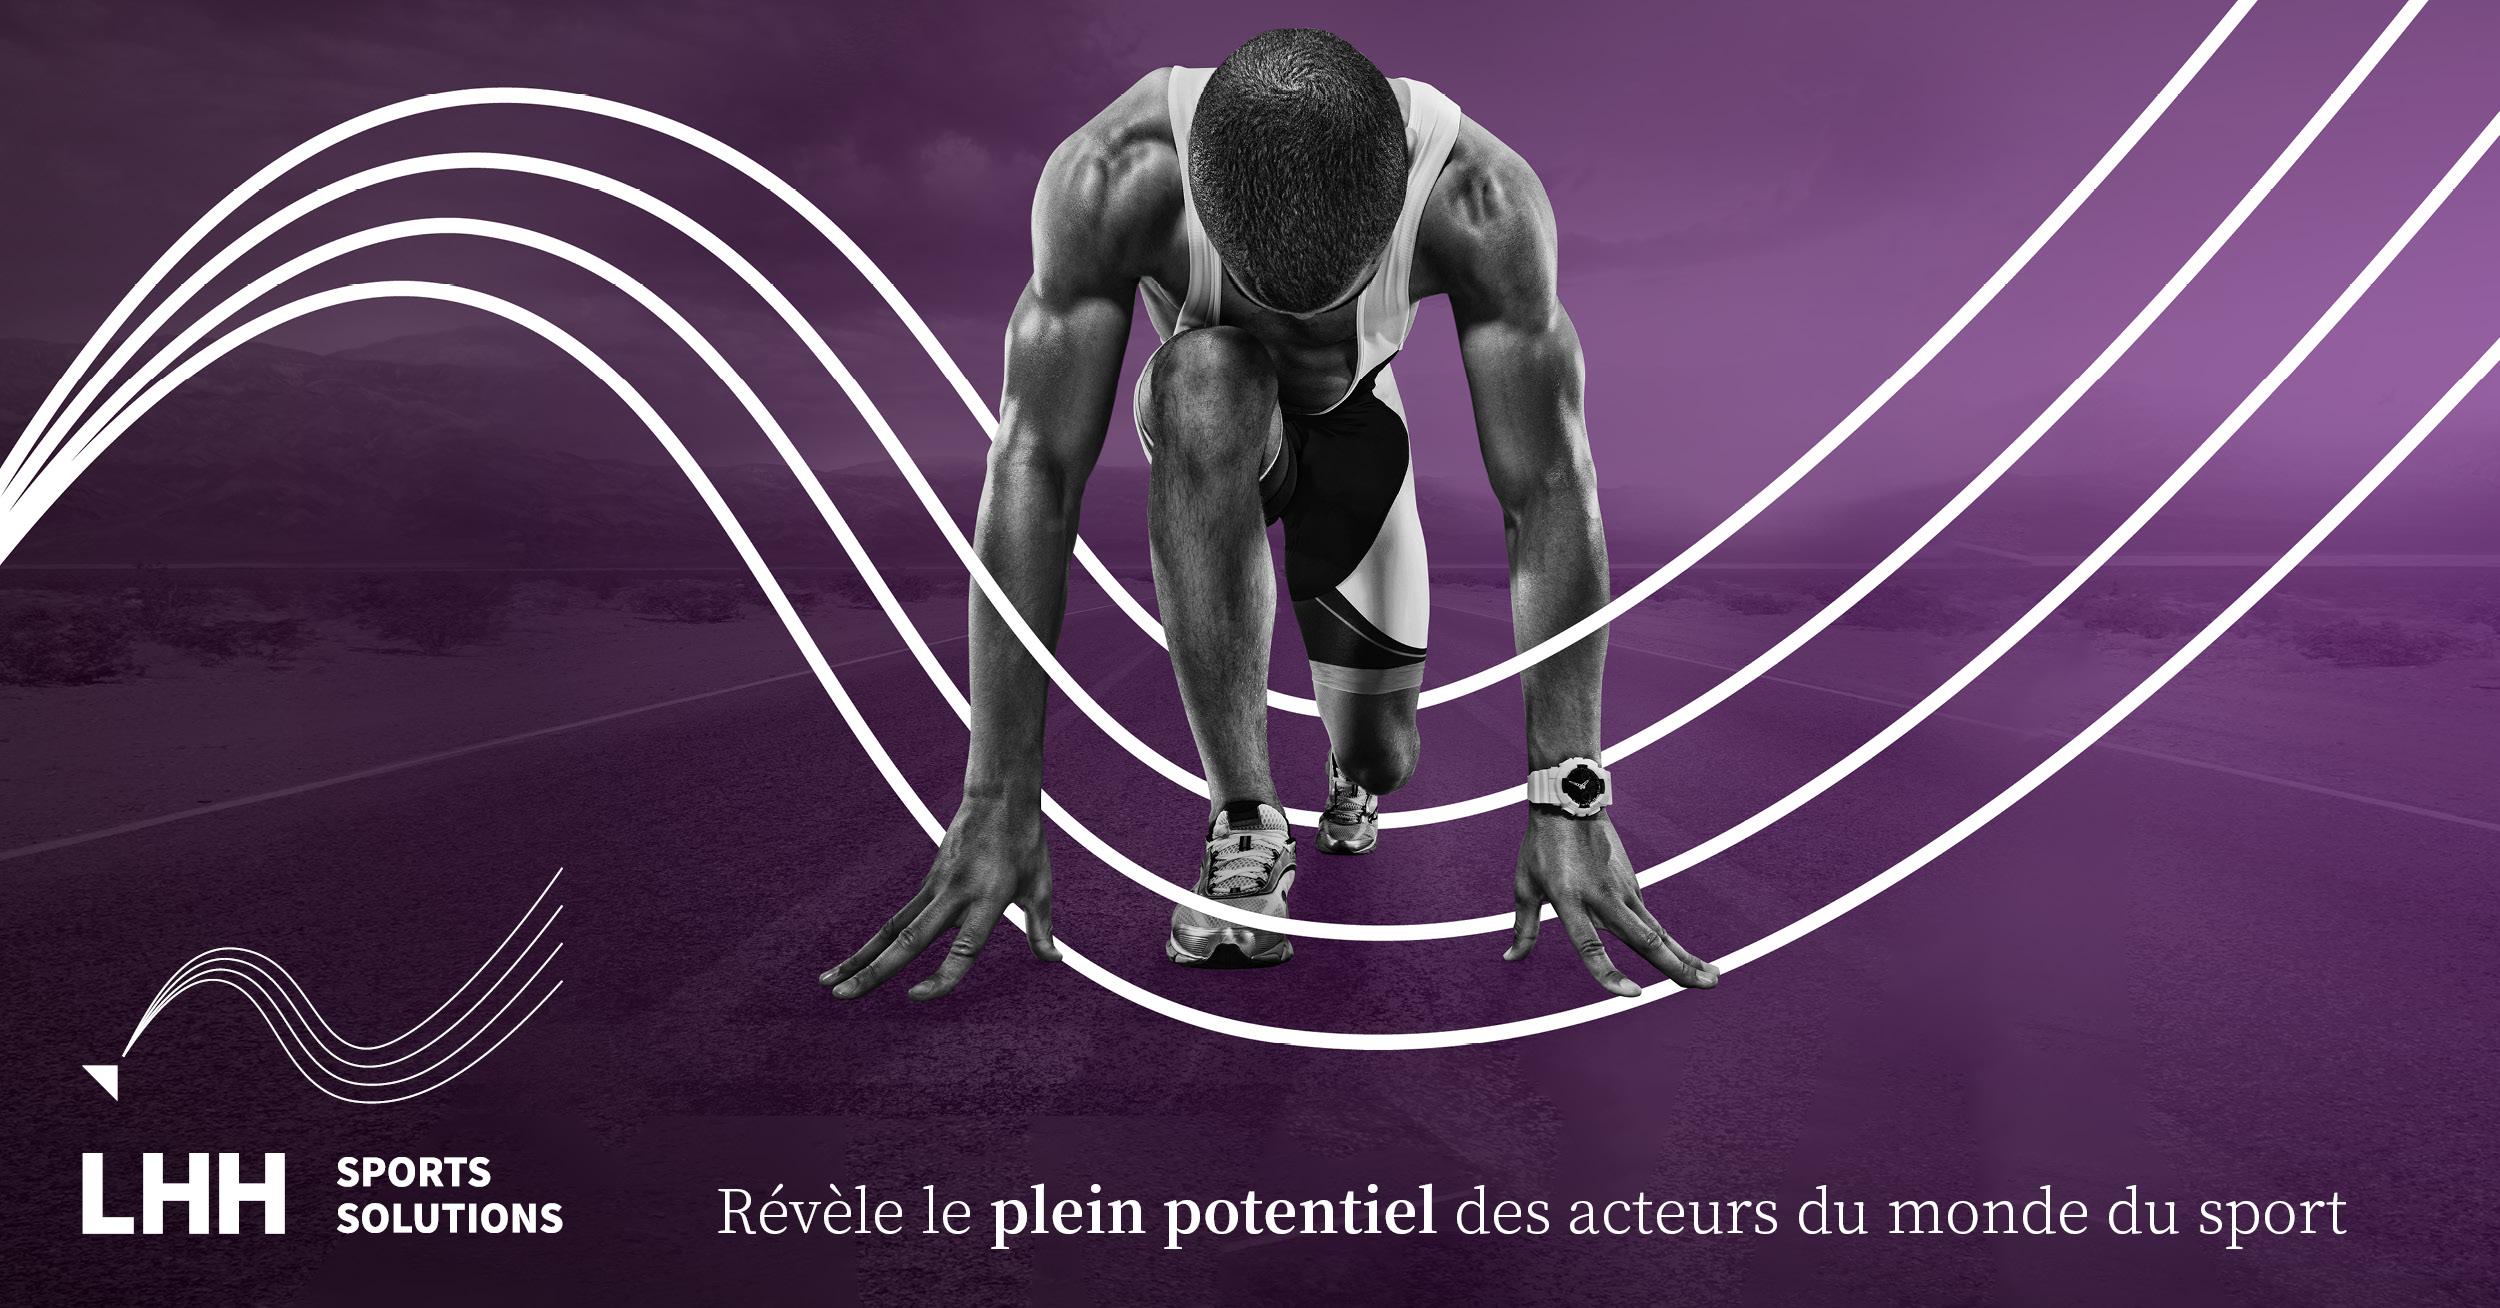 sport solution LHH